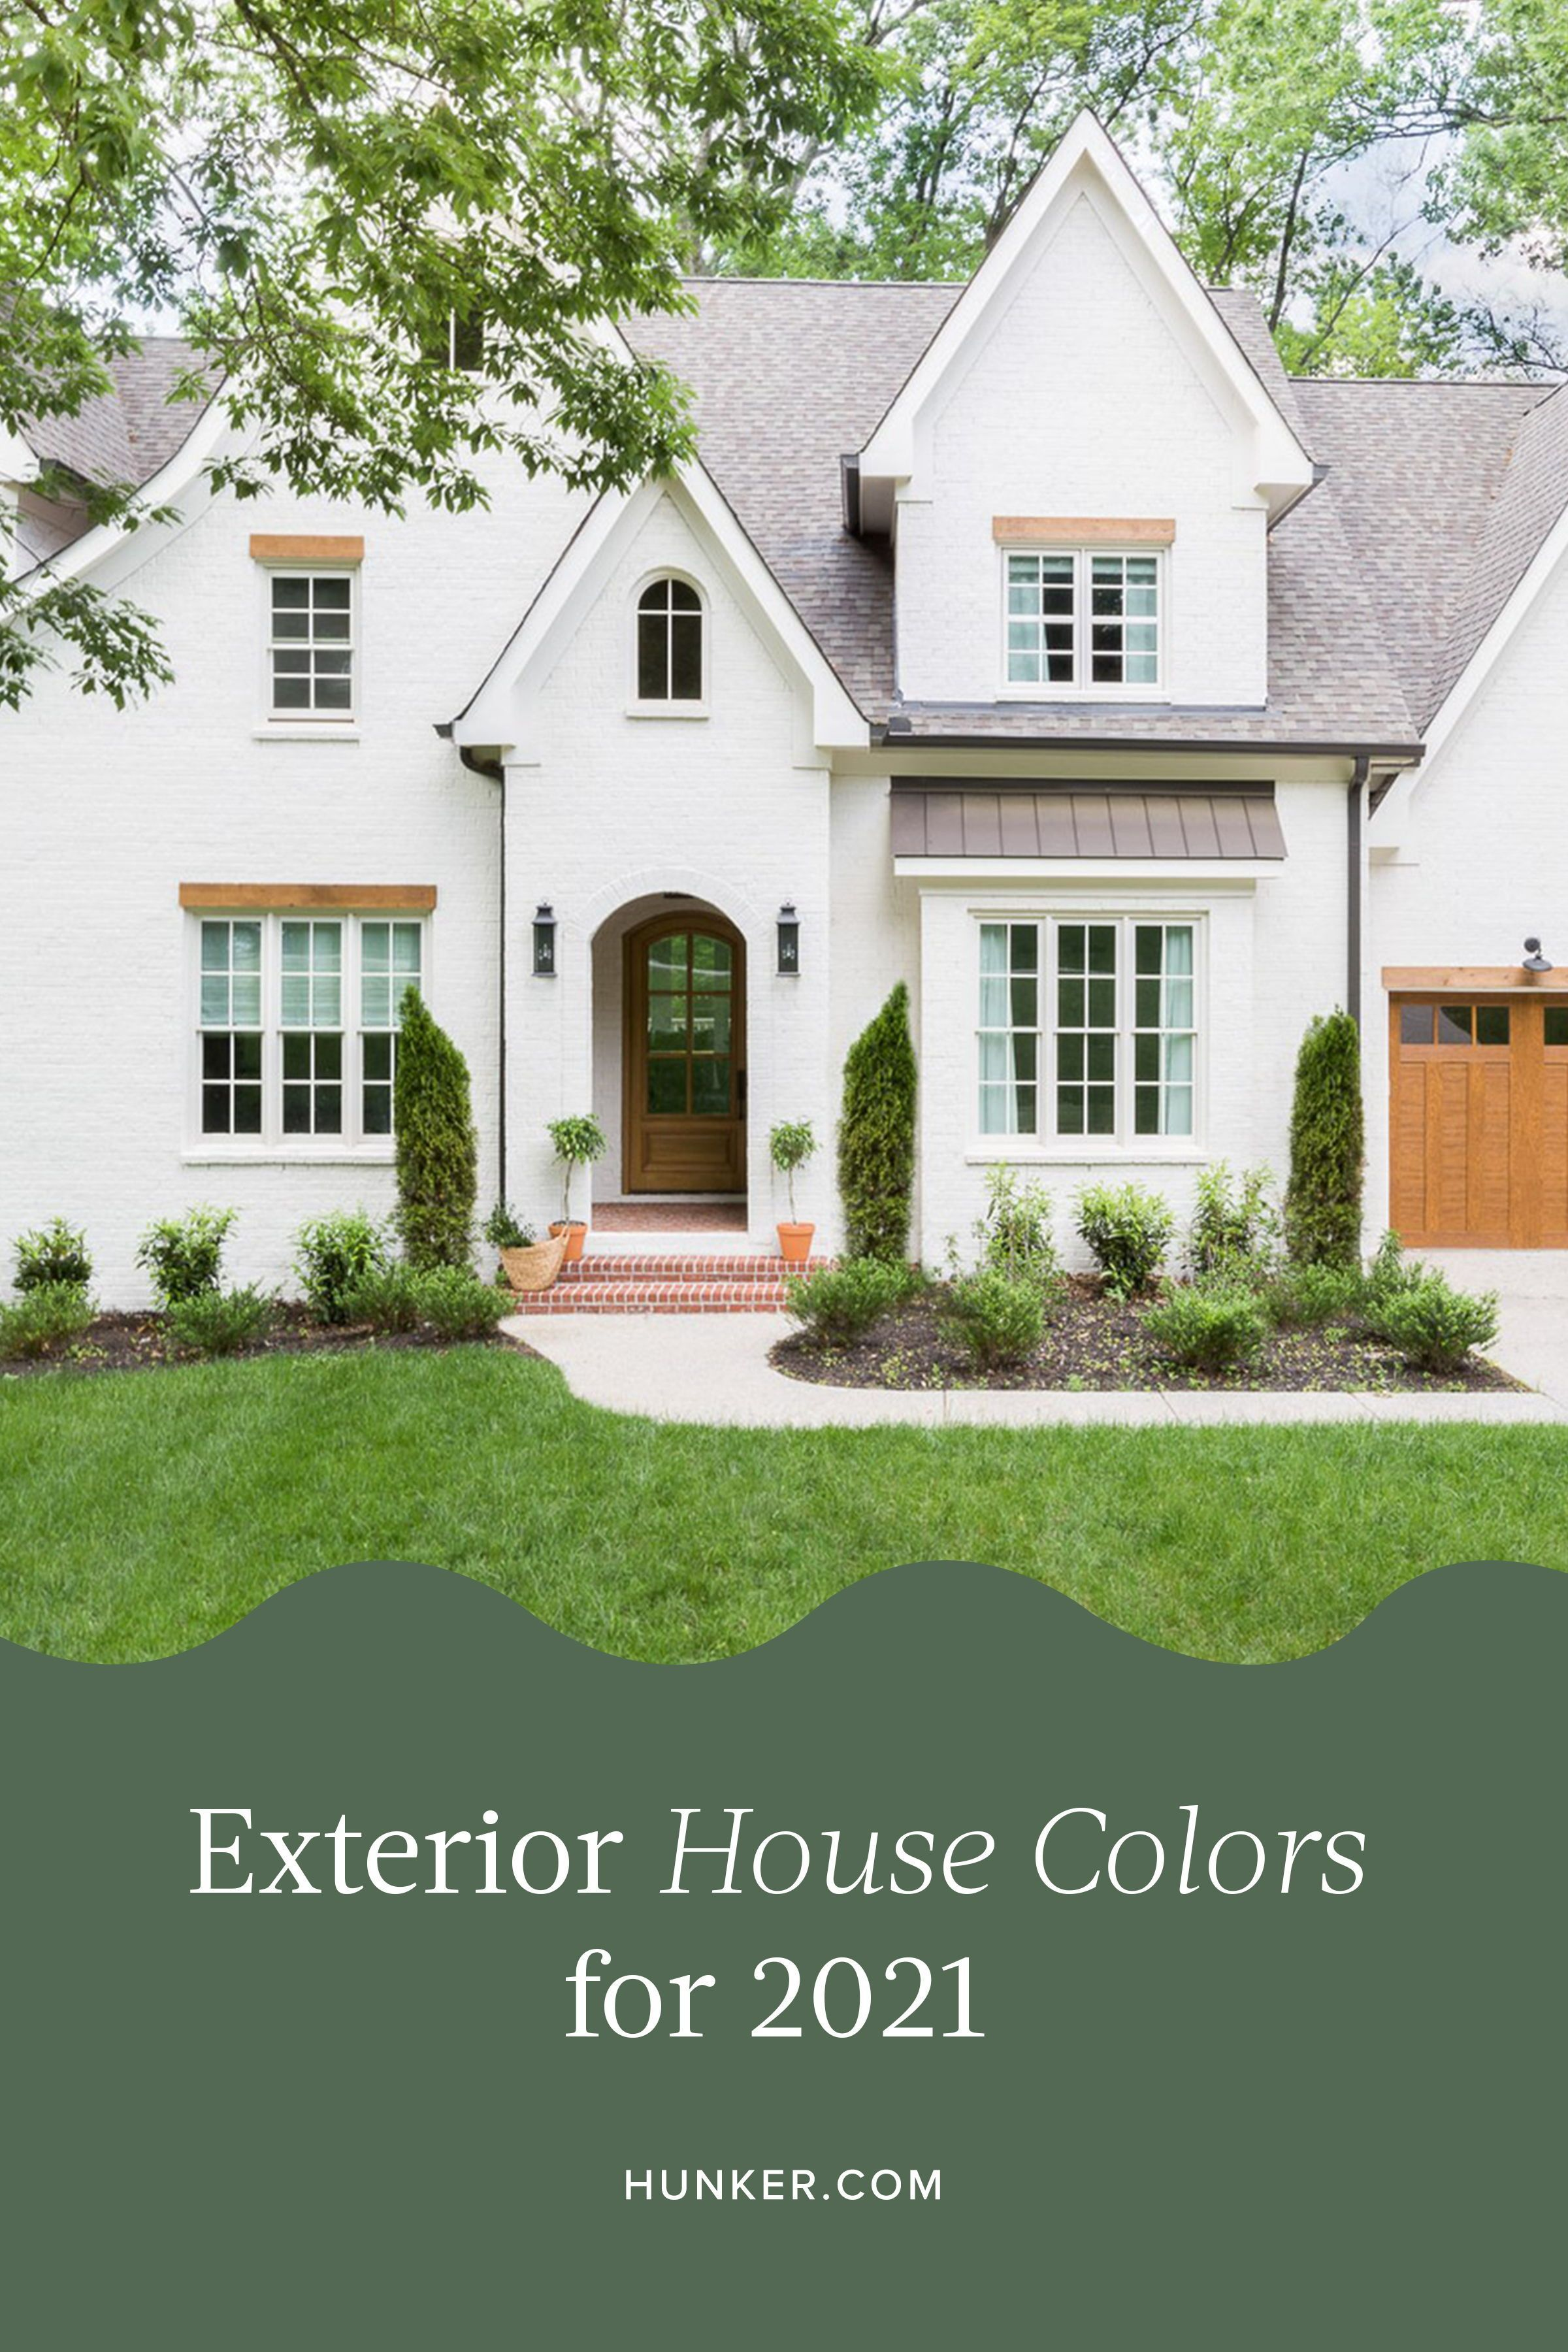 17+ Exterior house colors 2021 info